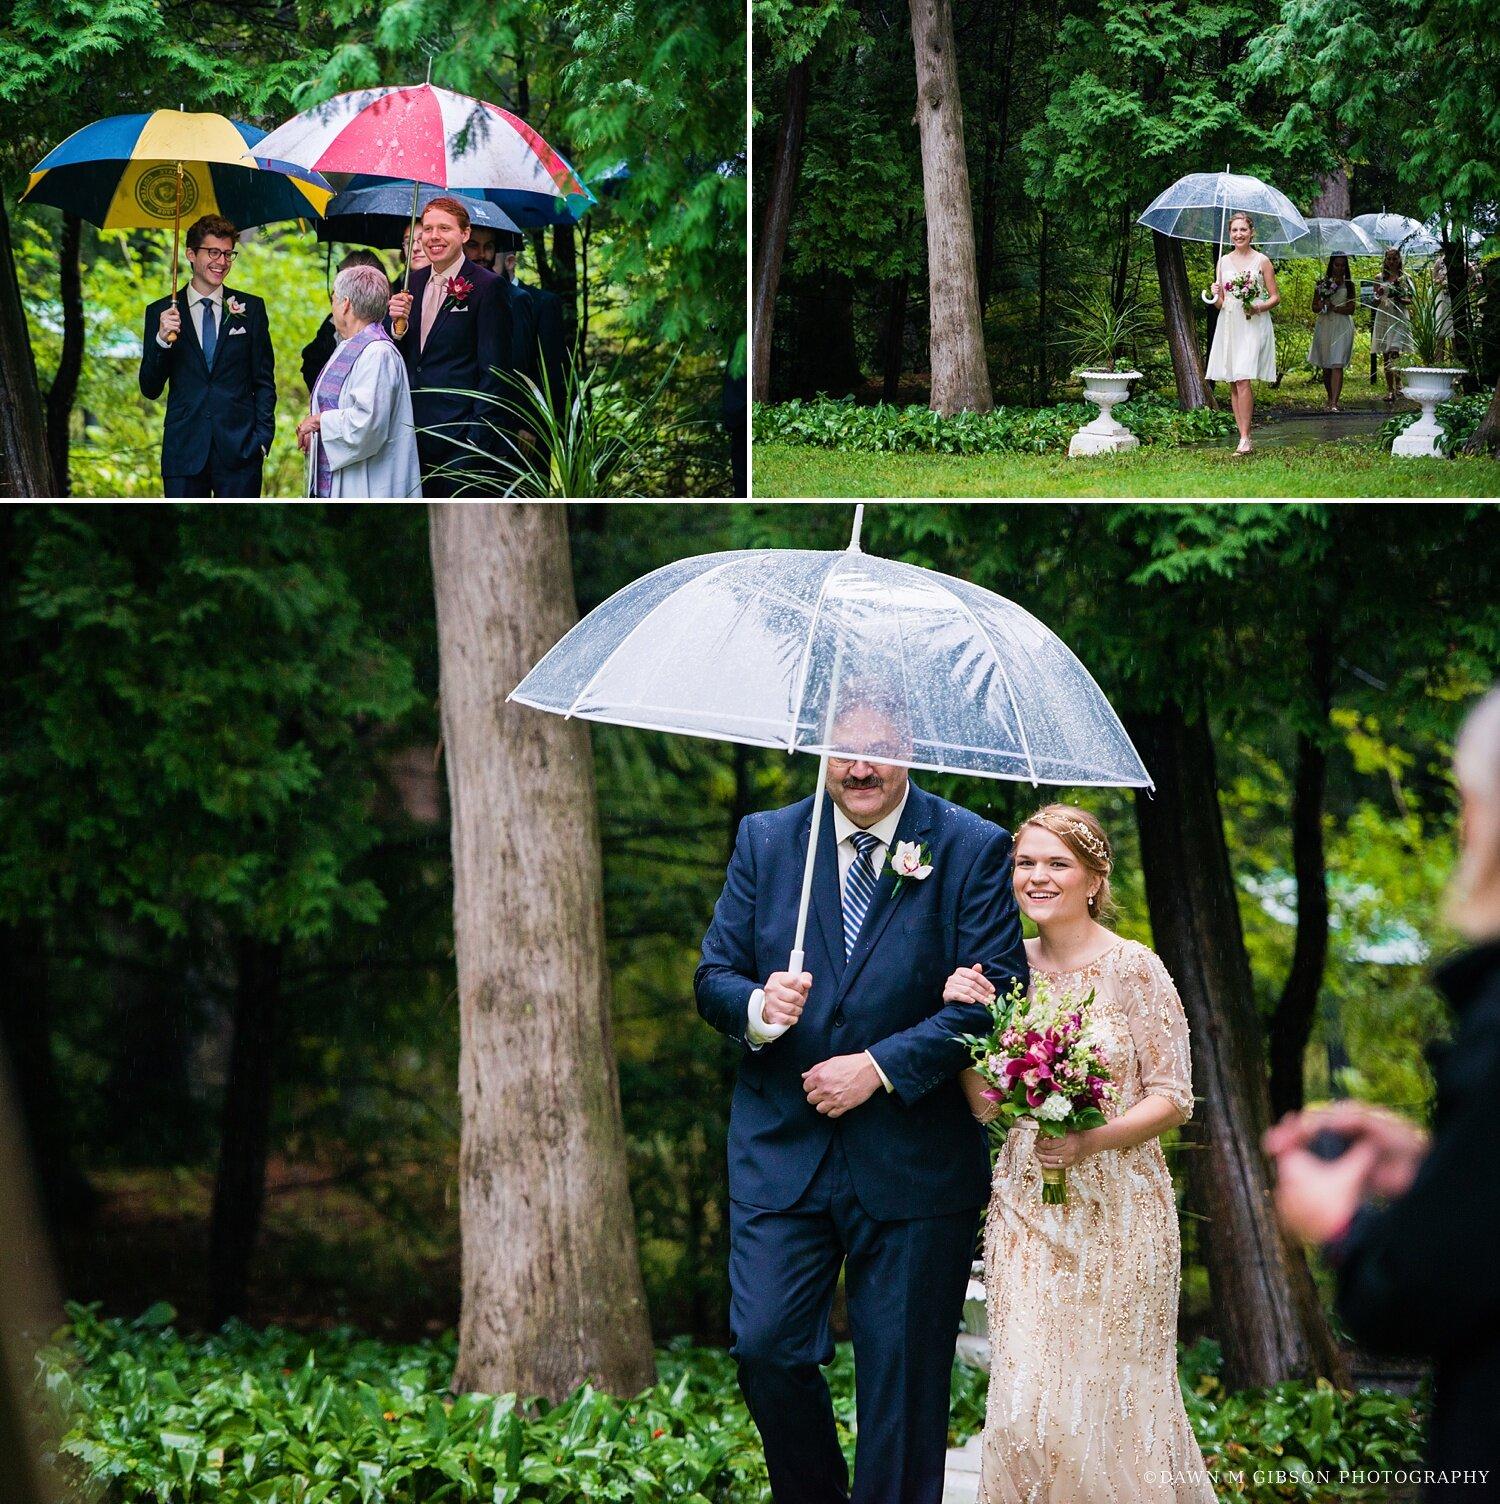 finger-lakes-newyork-wedding-photographer-sonnenberg-gardens-wedding-gold-wedding-dress-jenna-daniel_0032.jpg